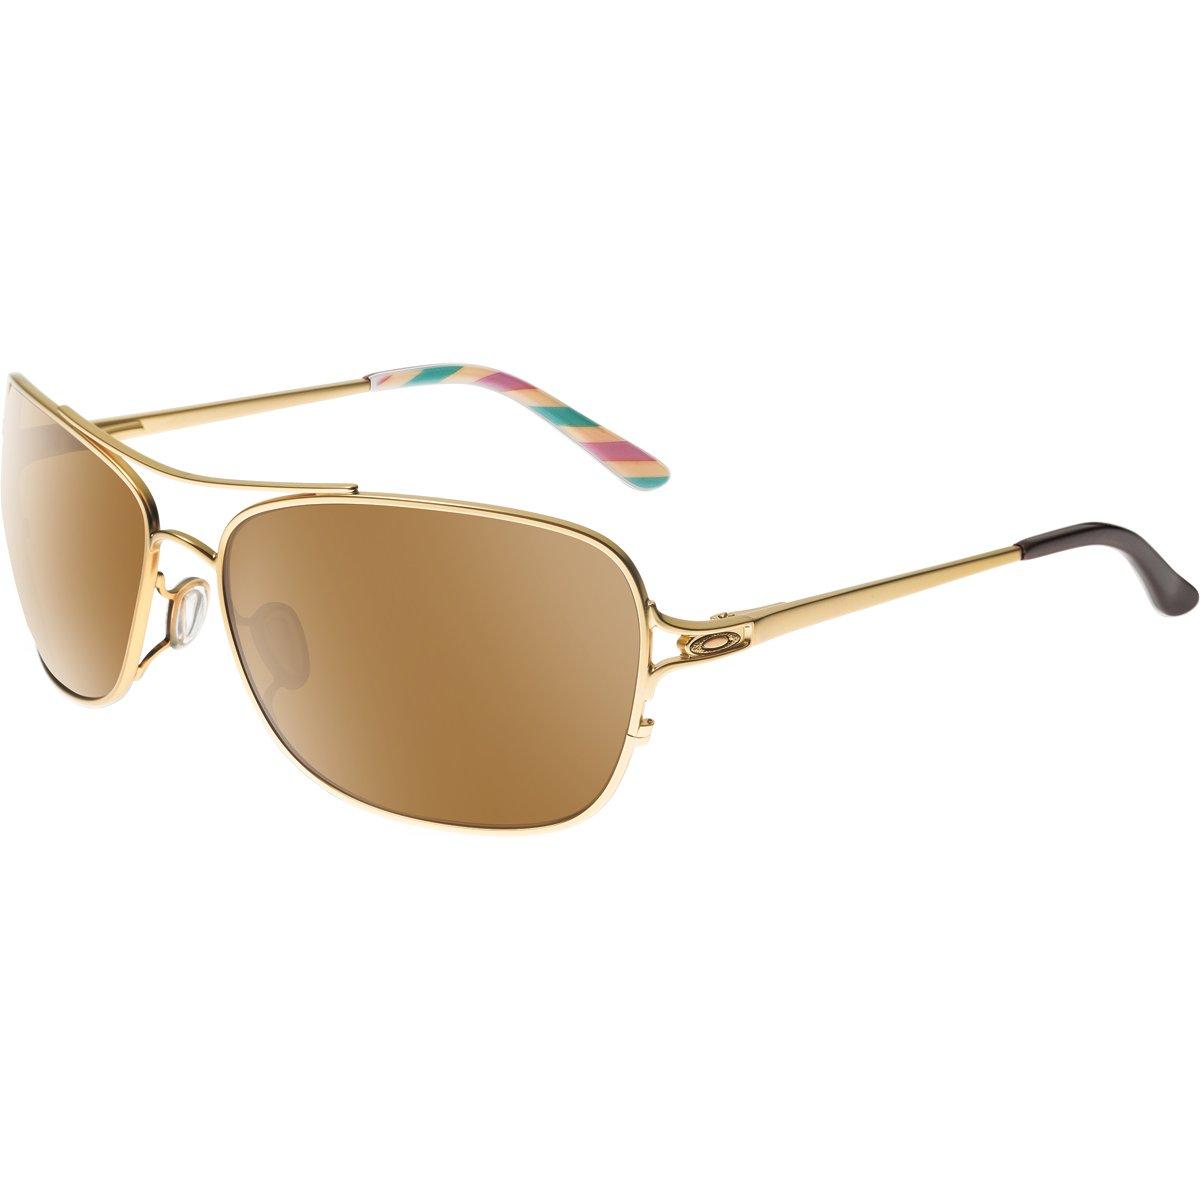 Oakley Women's OO4101 Conquest Aviator Steel Sunglasses, Satin Gold/Tungsten Iridium, 59 mm by Oakley